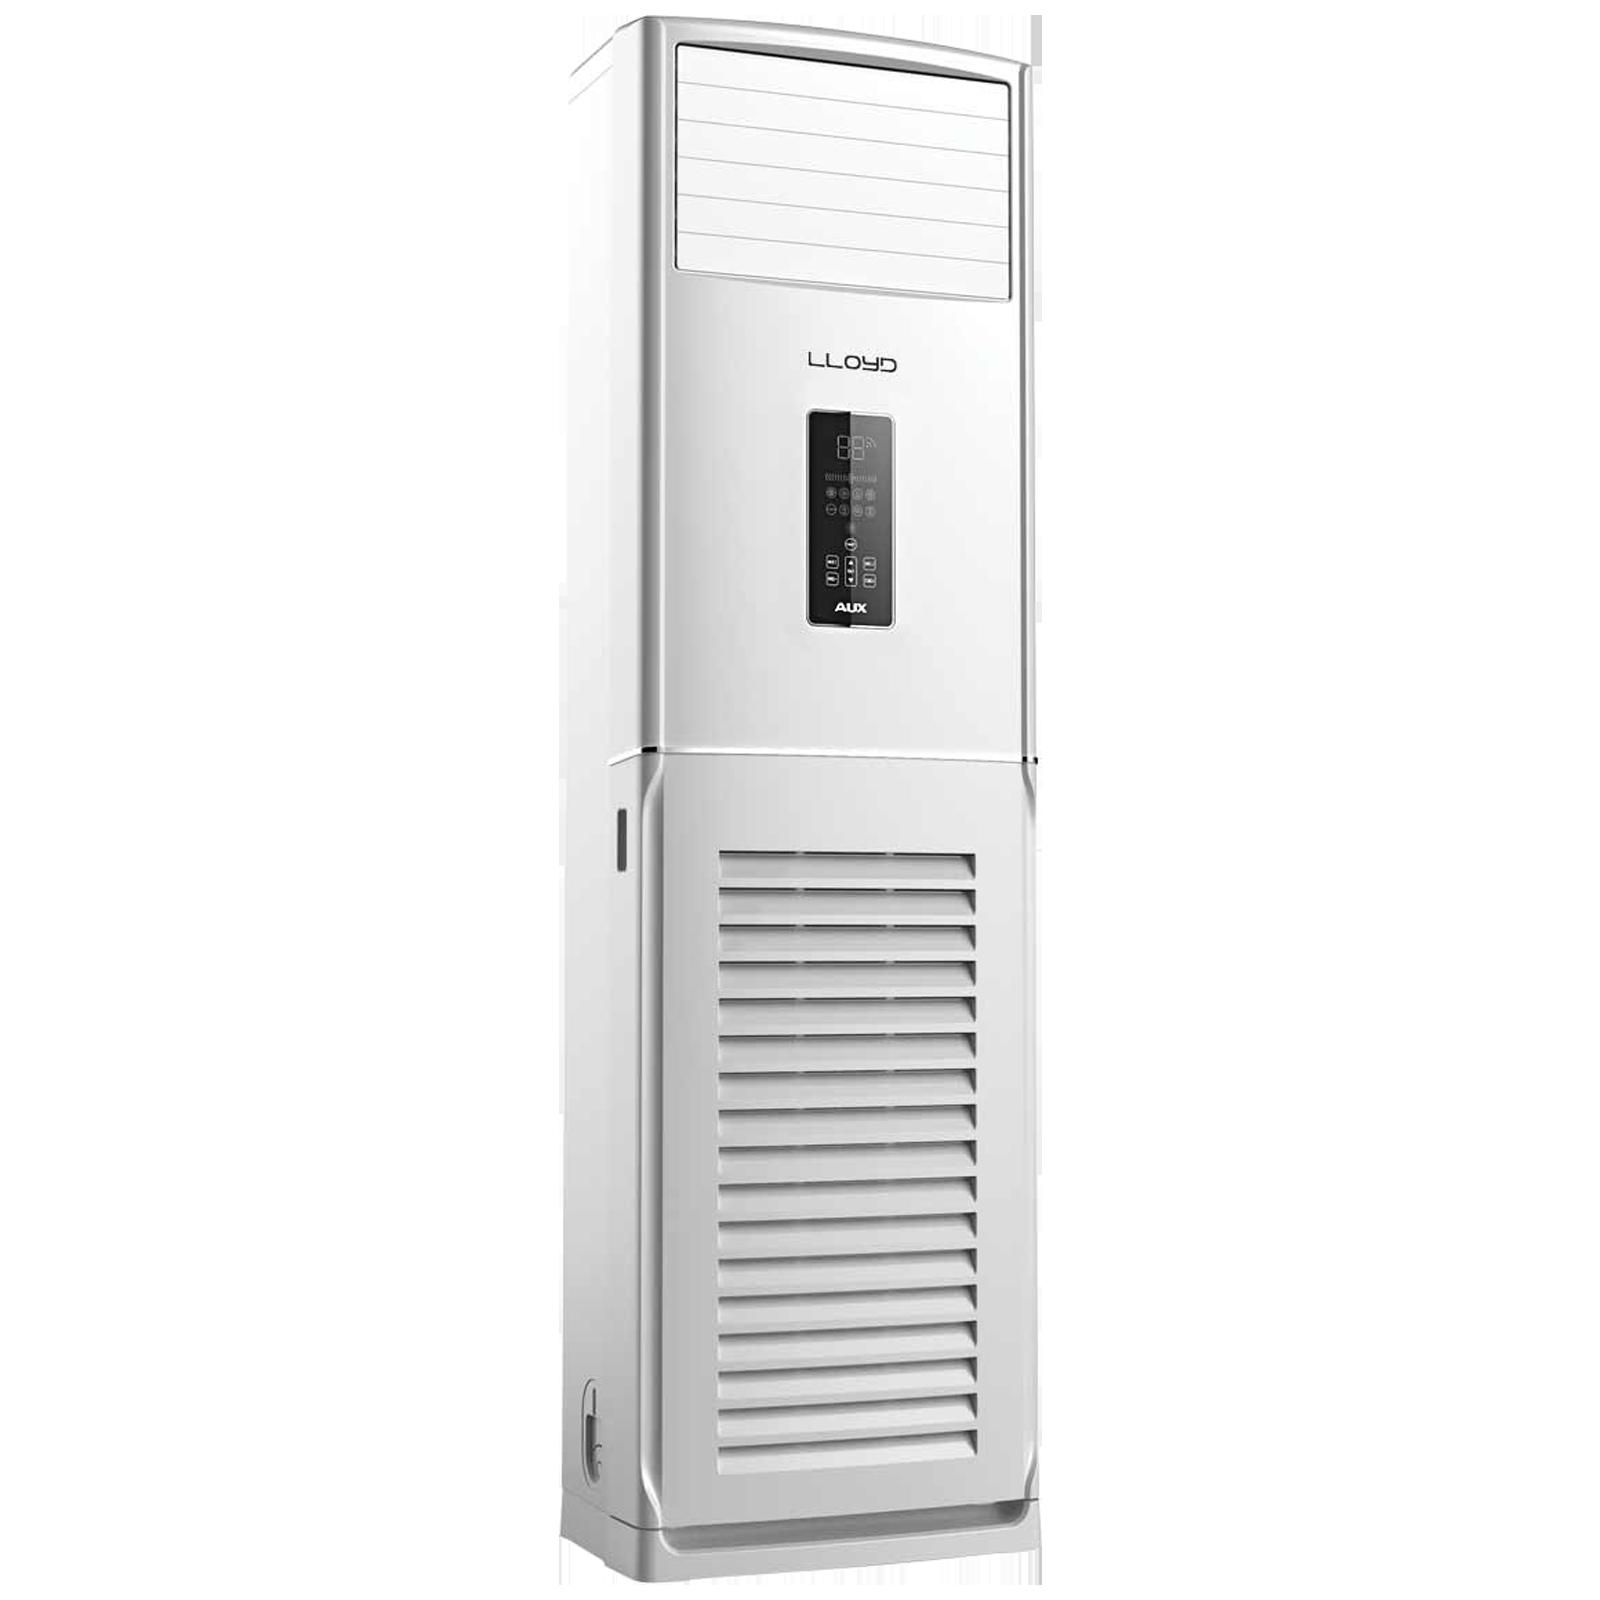 Lloyd 2 Ton 2 Star Tower AC (Copper Condenser, GLT24B22WAAG / White)_1